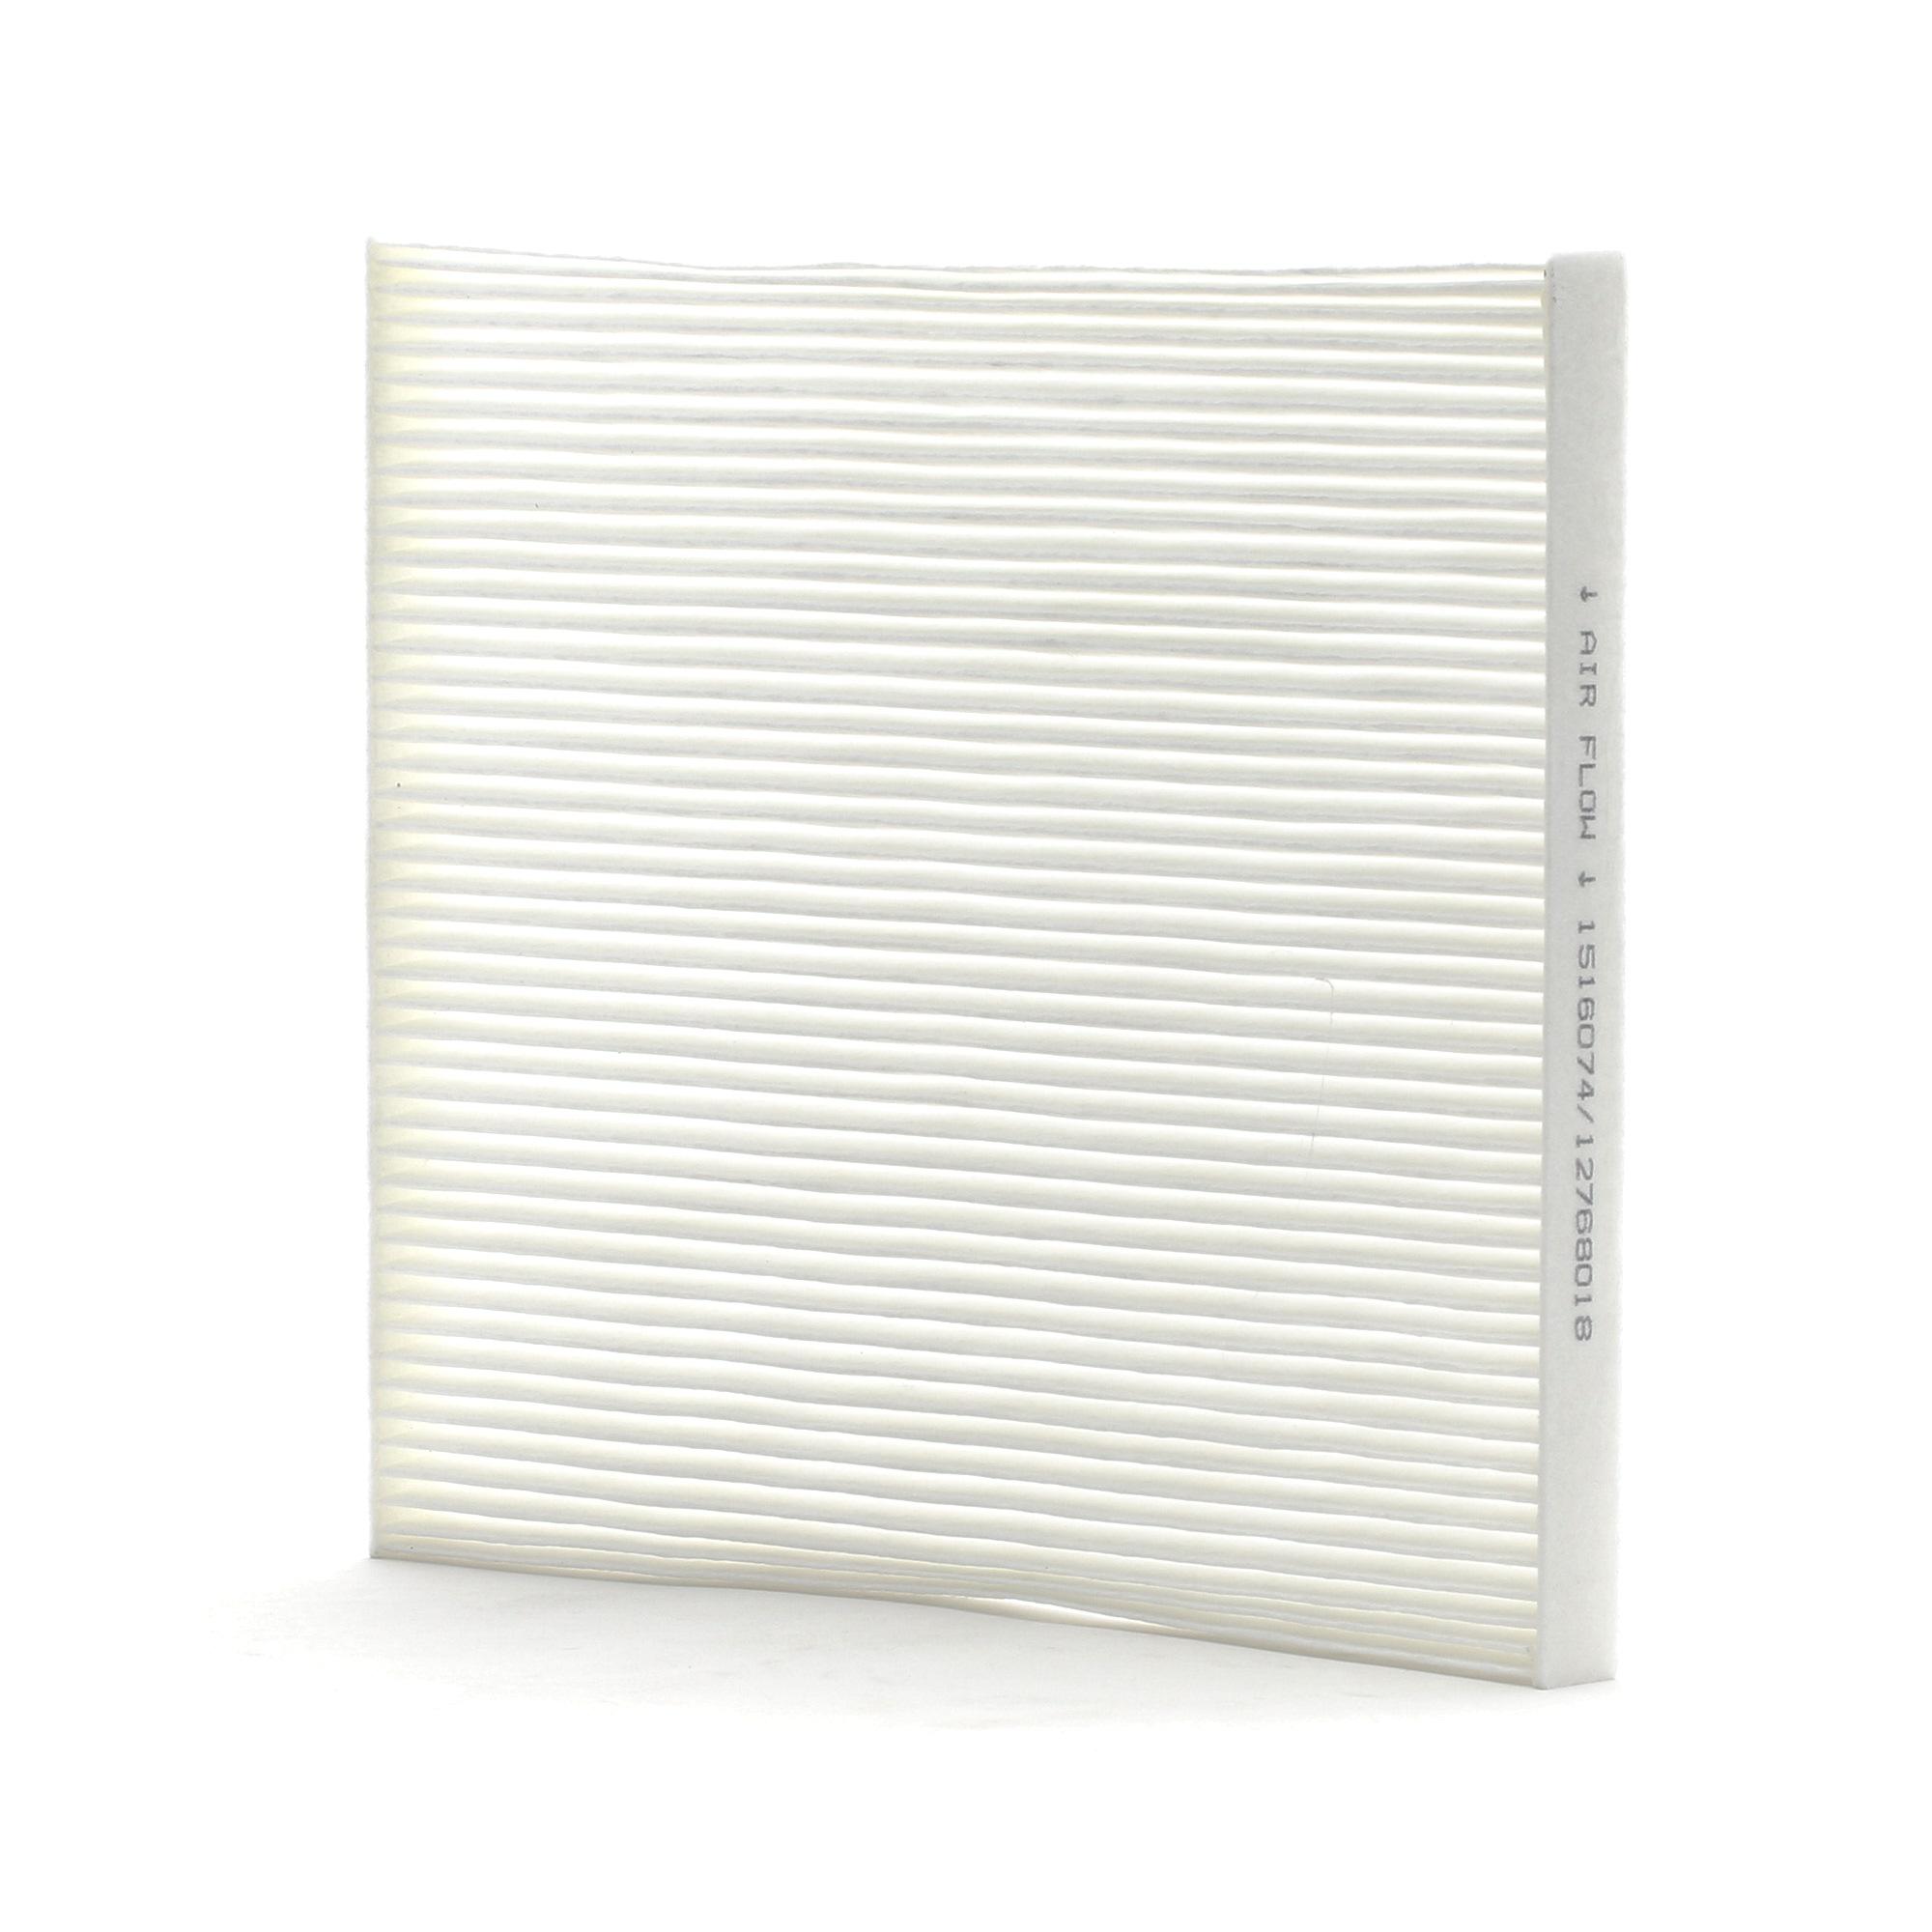 RIDEX Pollen Filter HYUNDAI,KIA 424I0436 14611001,19130294,9272249431 Cabin Filter,Cabin Air Filter,Filter, interior air GM07113P,971332W000,F784EB9AA